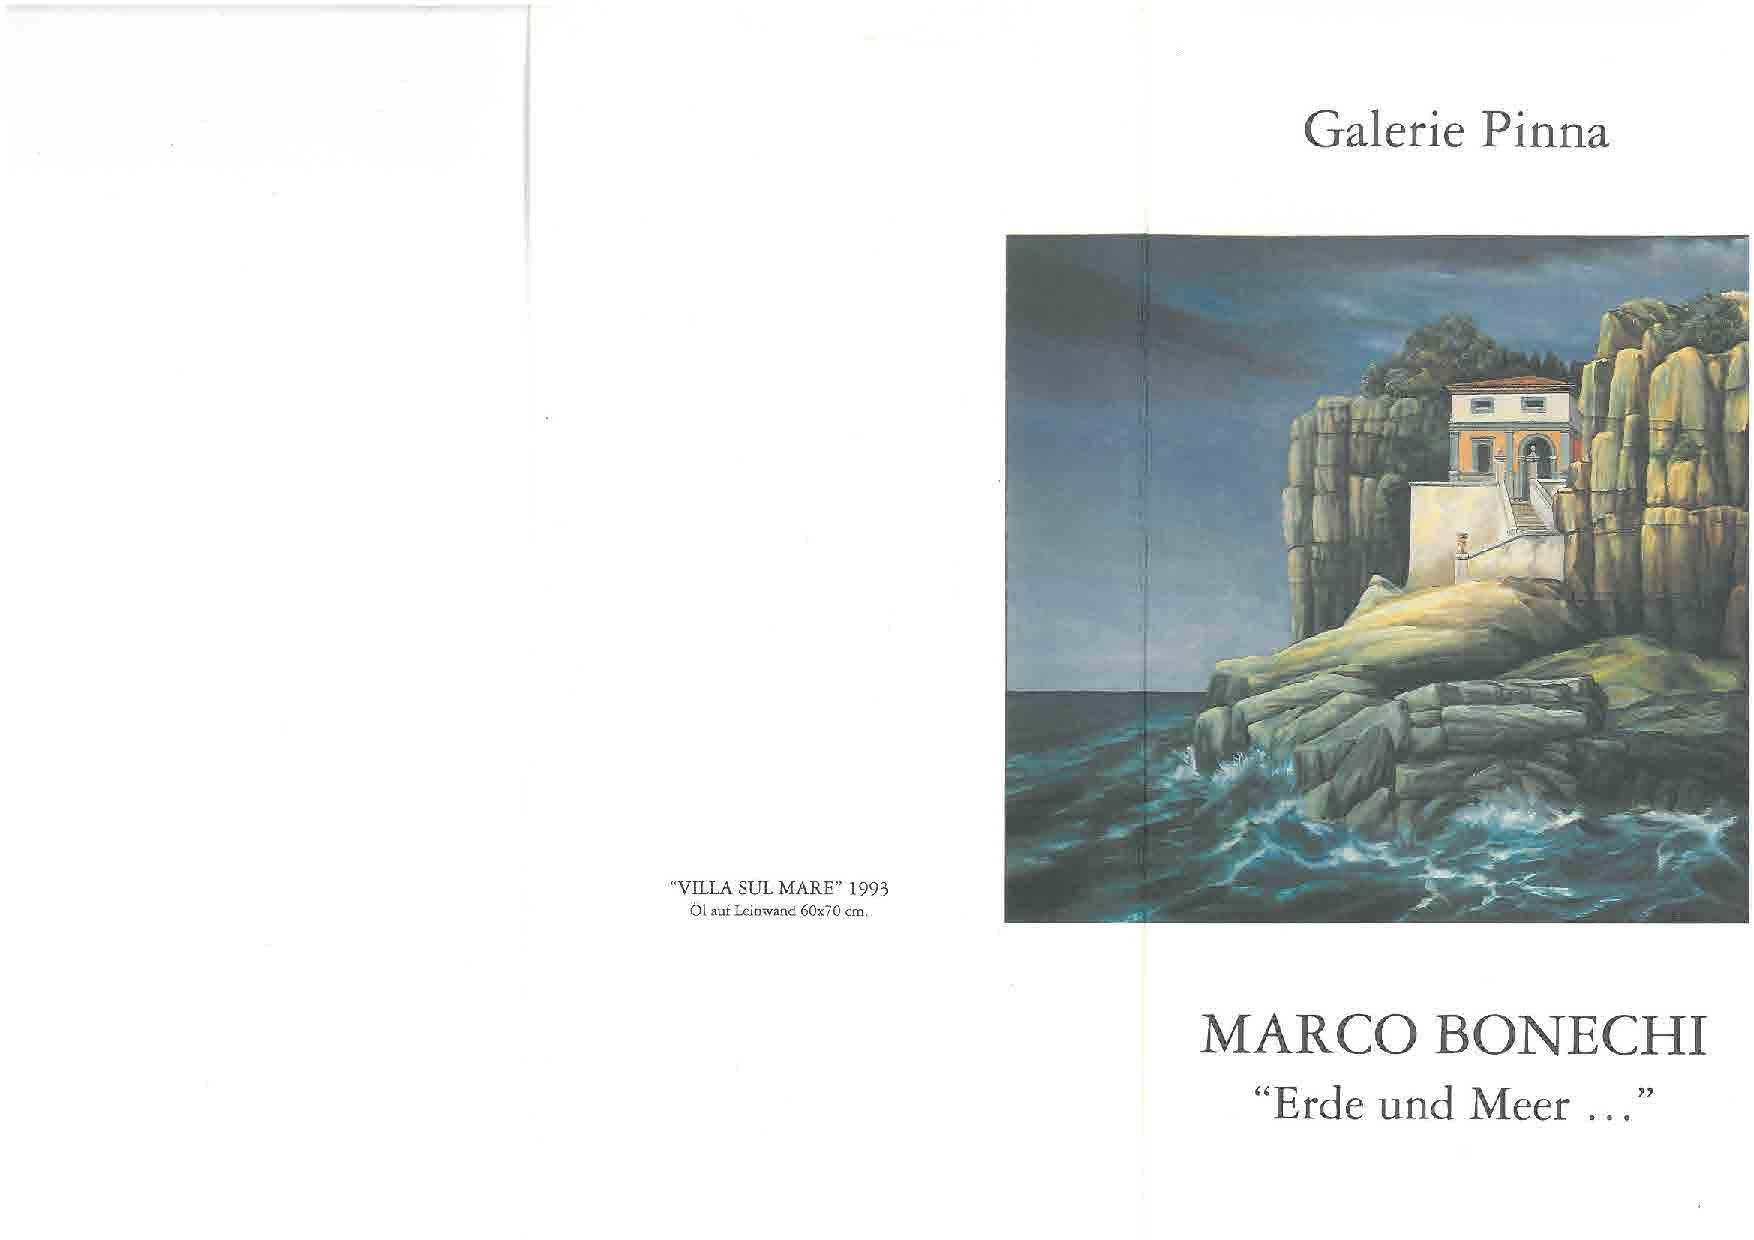 Marco_Bonechi_Mostra_Personale_Galleria_Pinna